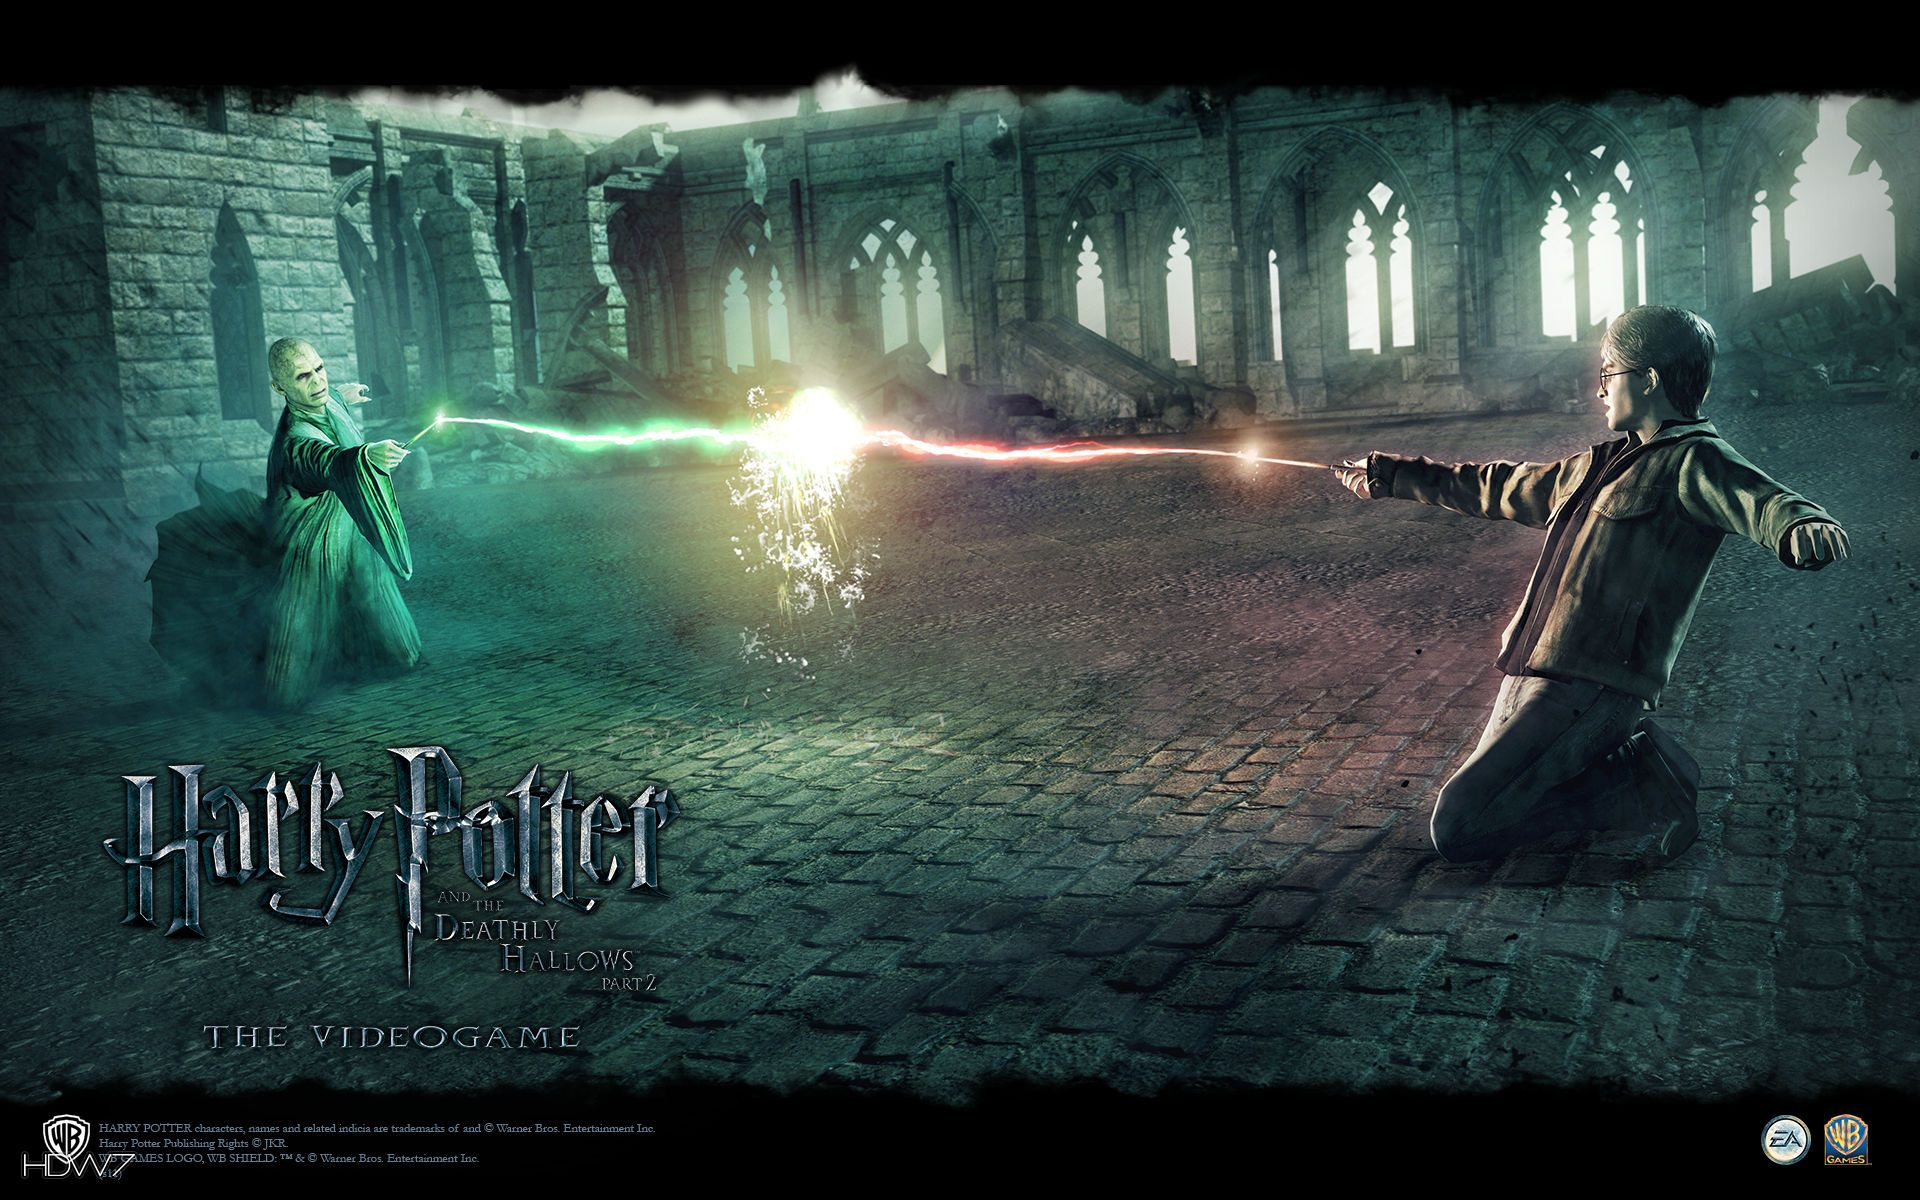 Fantastic Wallpaper Harry Potter Tablet - 6e634f9dff84d493f479afdd18a15f74  Pictures_128481.jpg